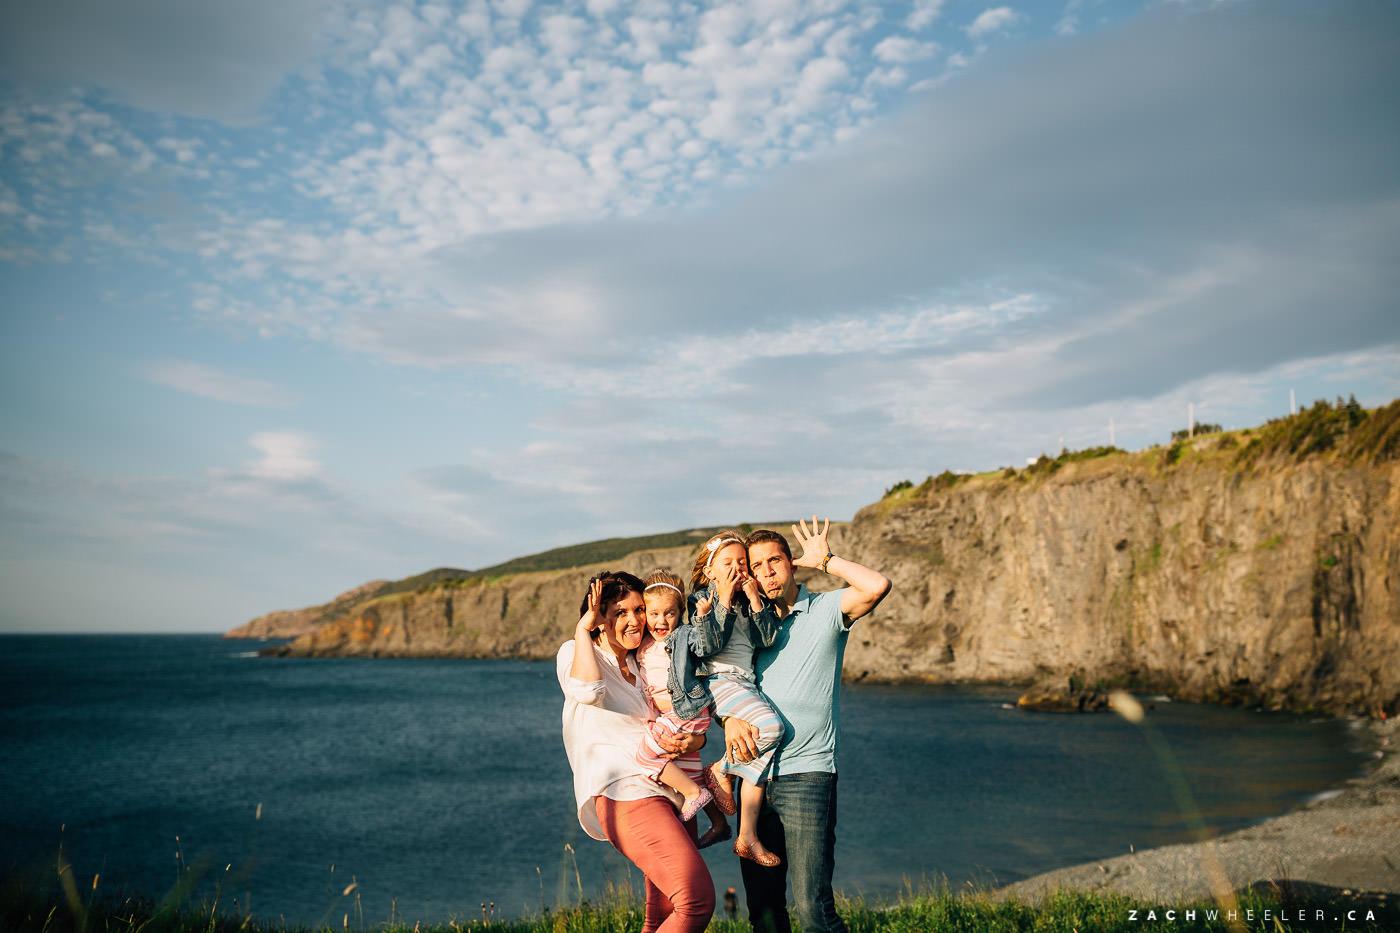 Family-Photography-StJohns-Beach-19